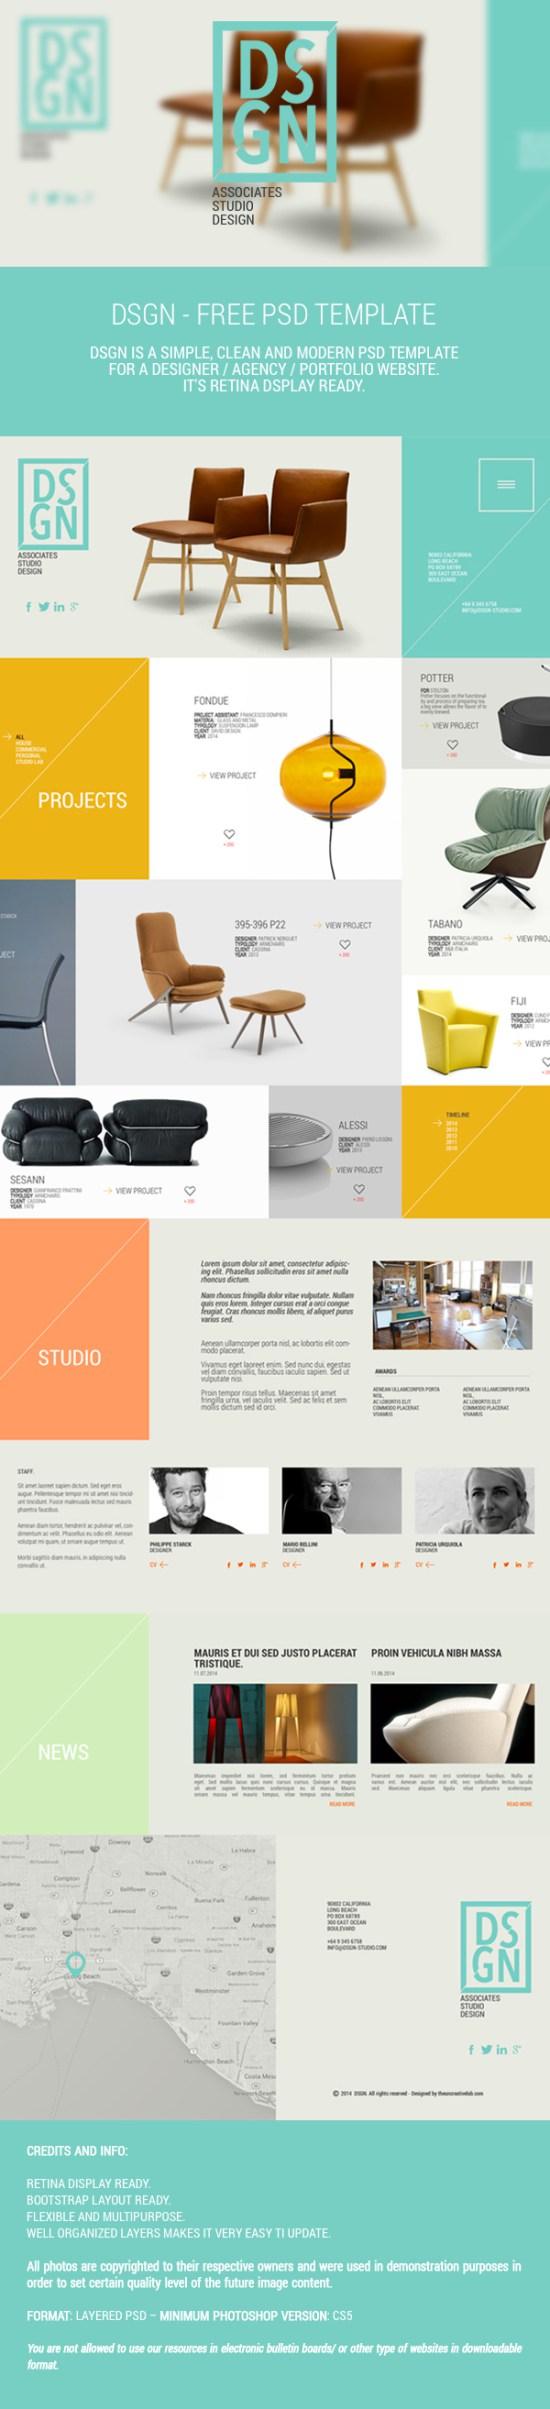 Free PSD Website Theme Template by Designhub719